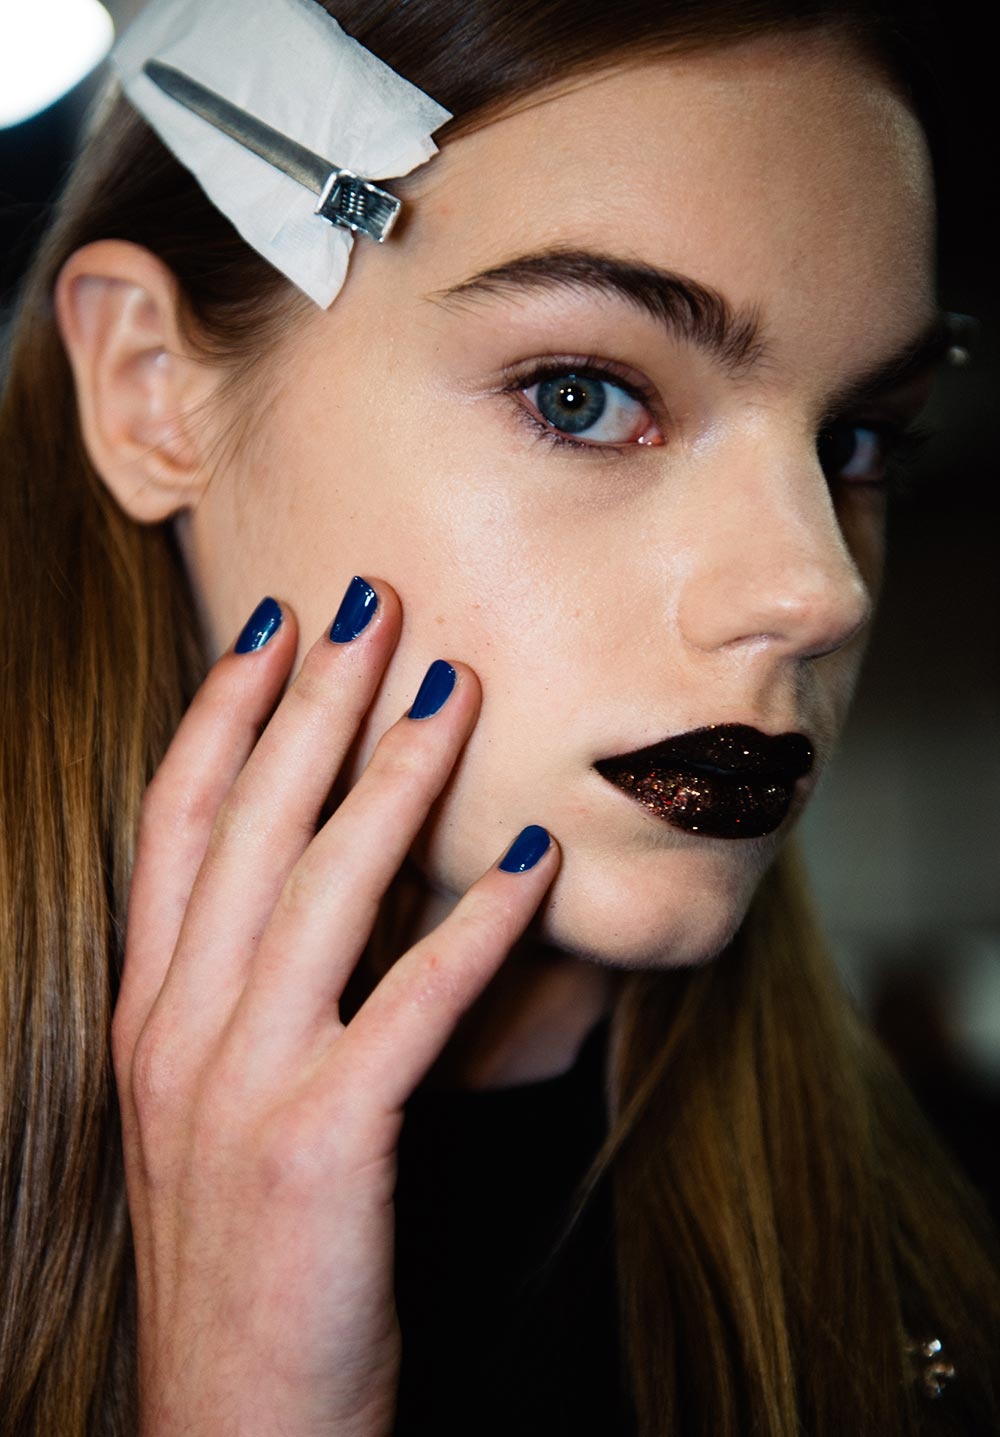 dkny-spring-2017-backstage-makeup-nails